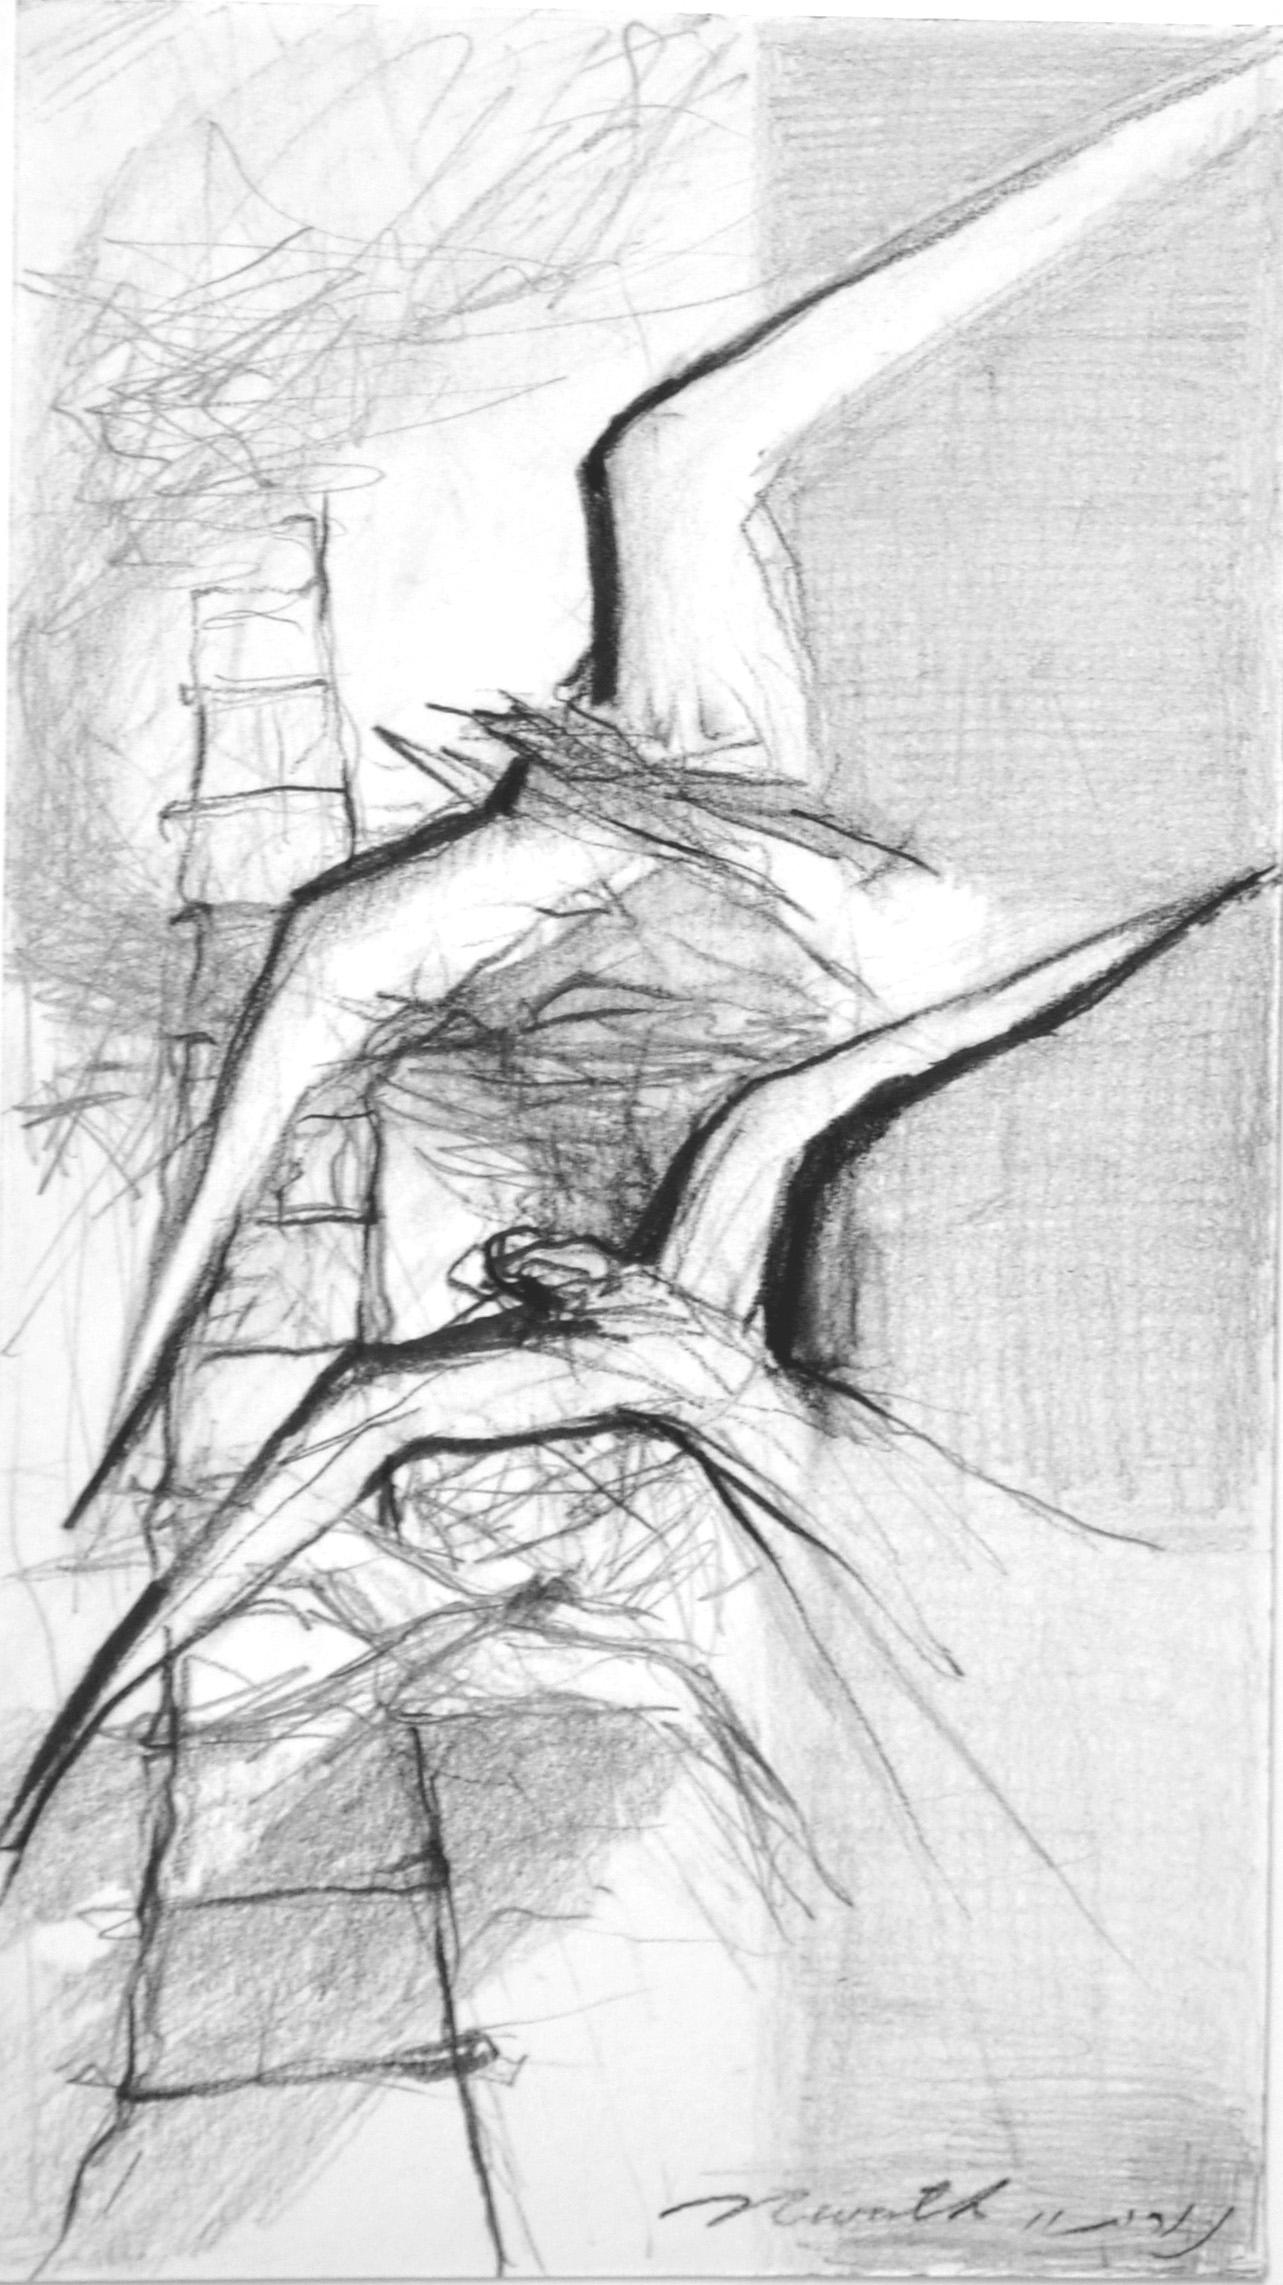 12x21 cm pencil on paper 1763 sh.jpg